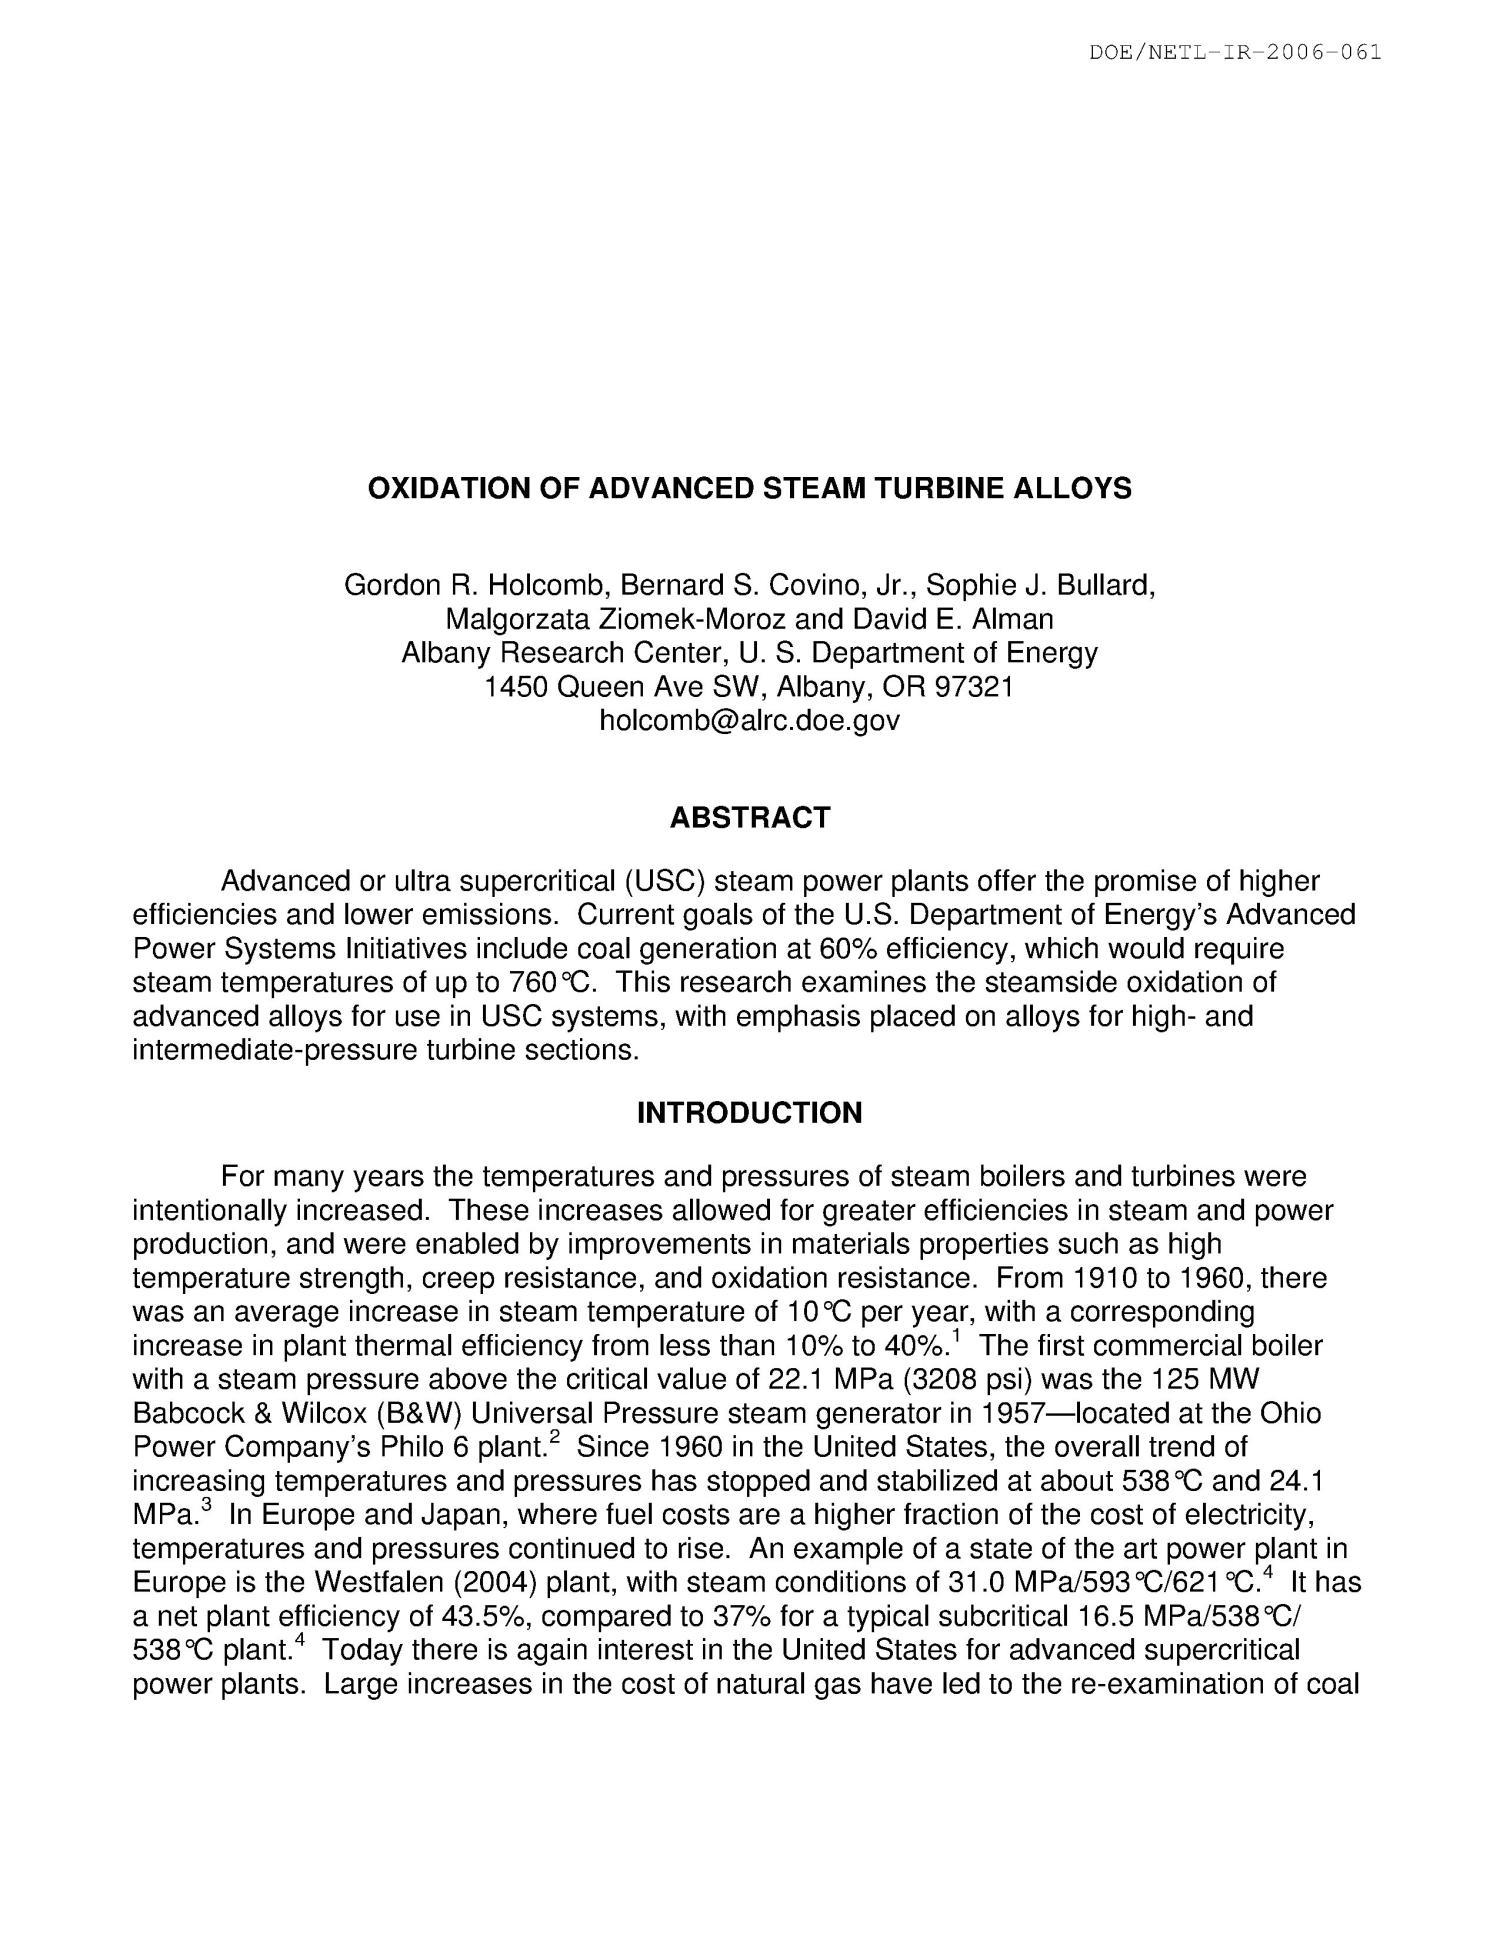 Oxidation of advanced steam turbine alloys Digital Library